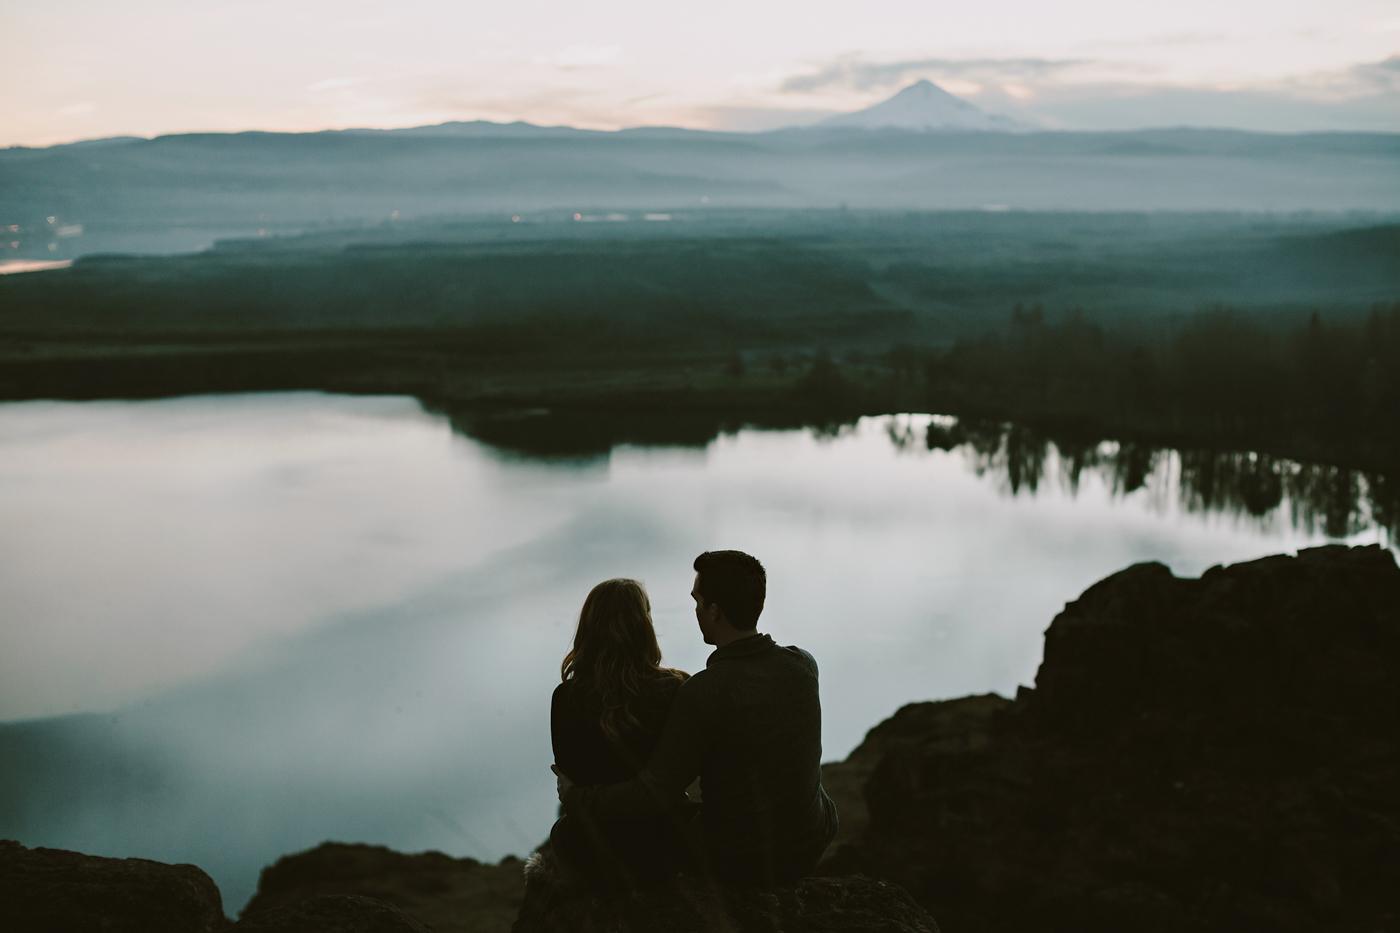 Couple overlooks mt hood from the desert at sunset